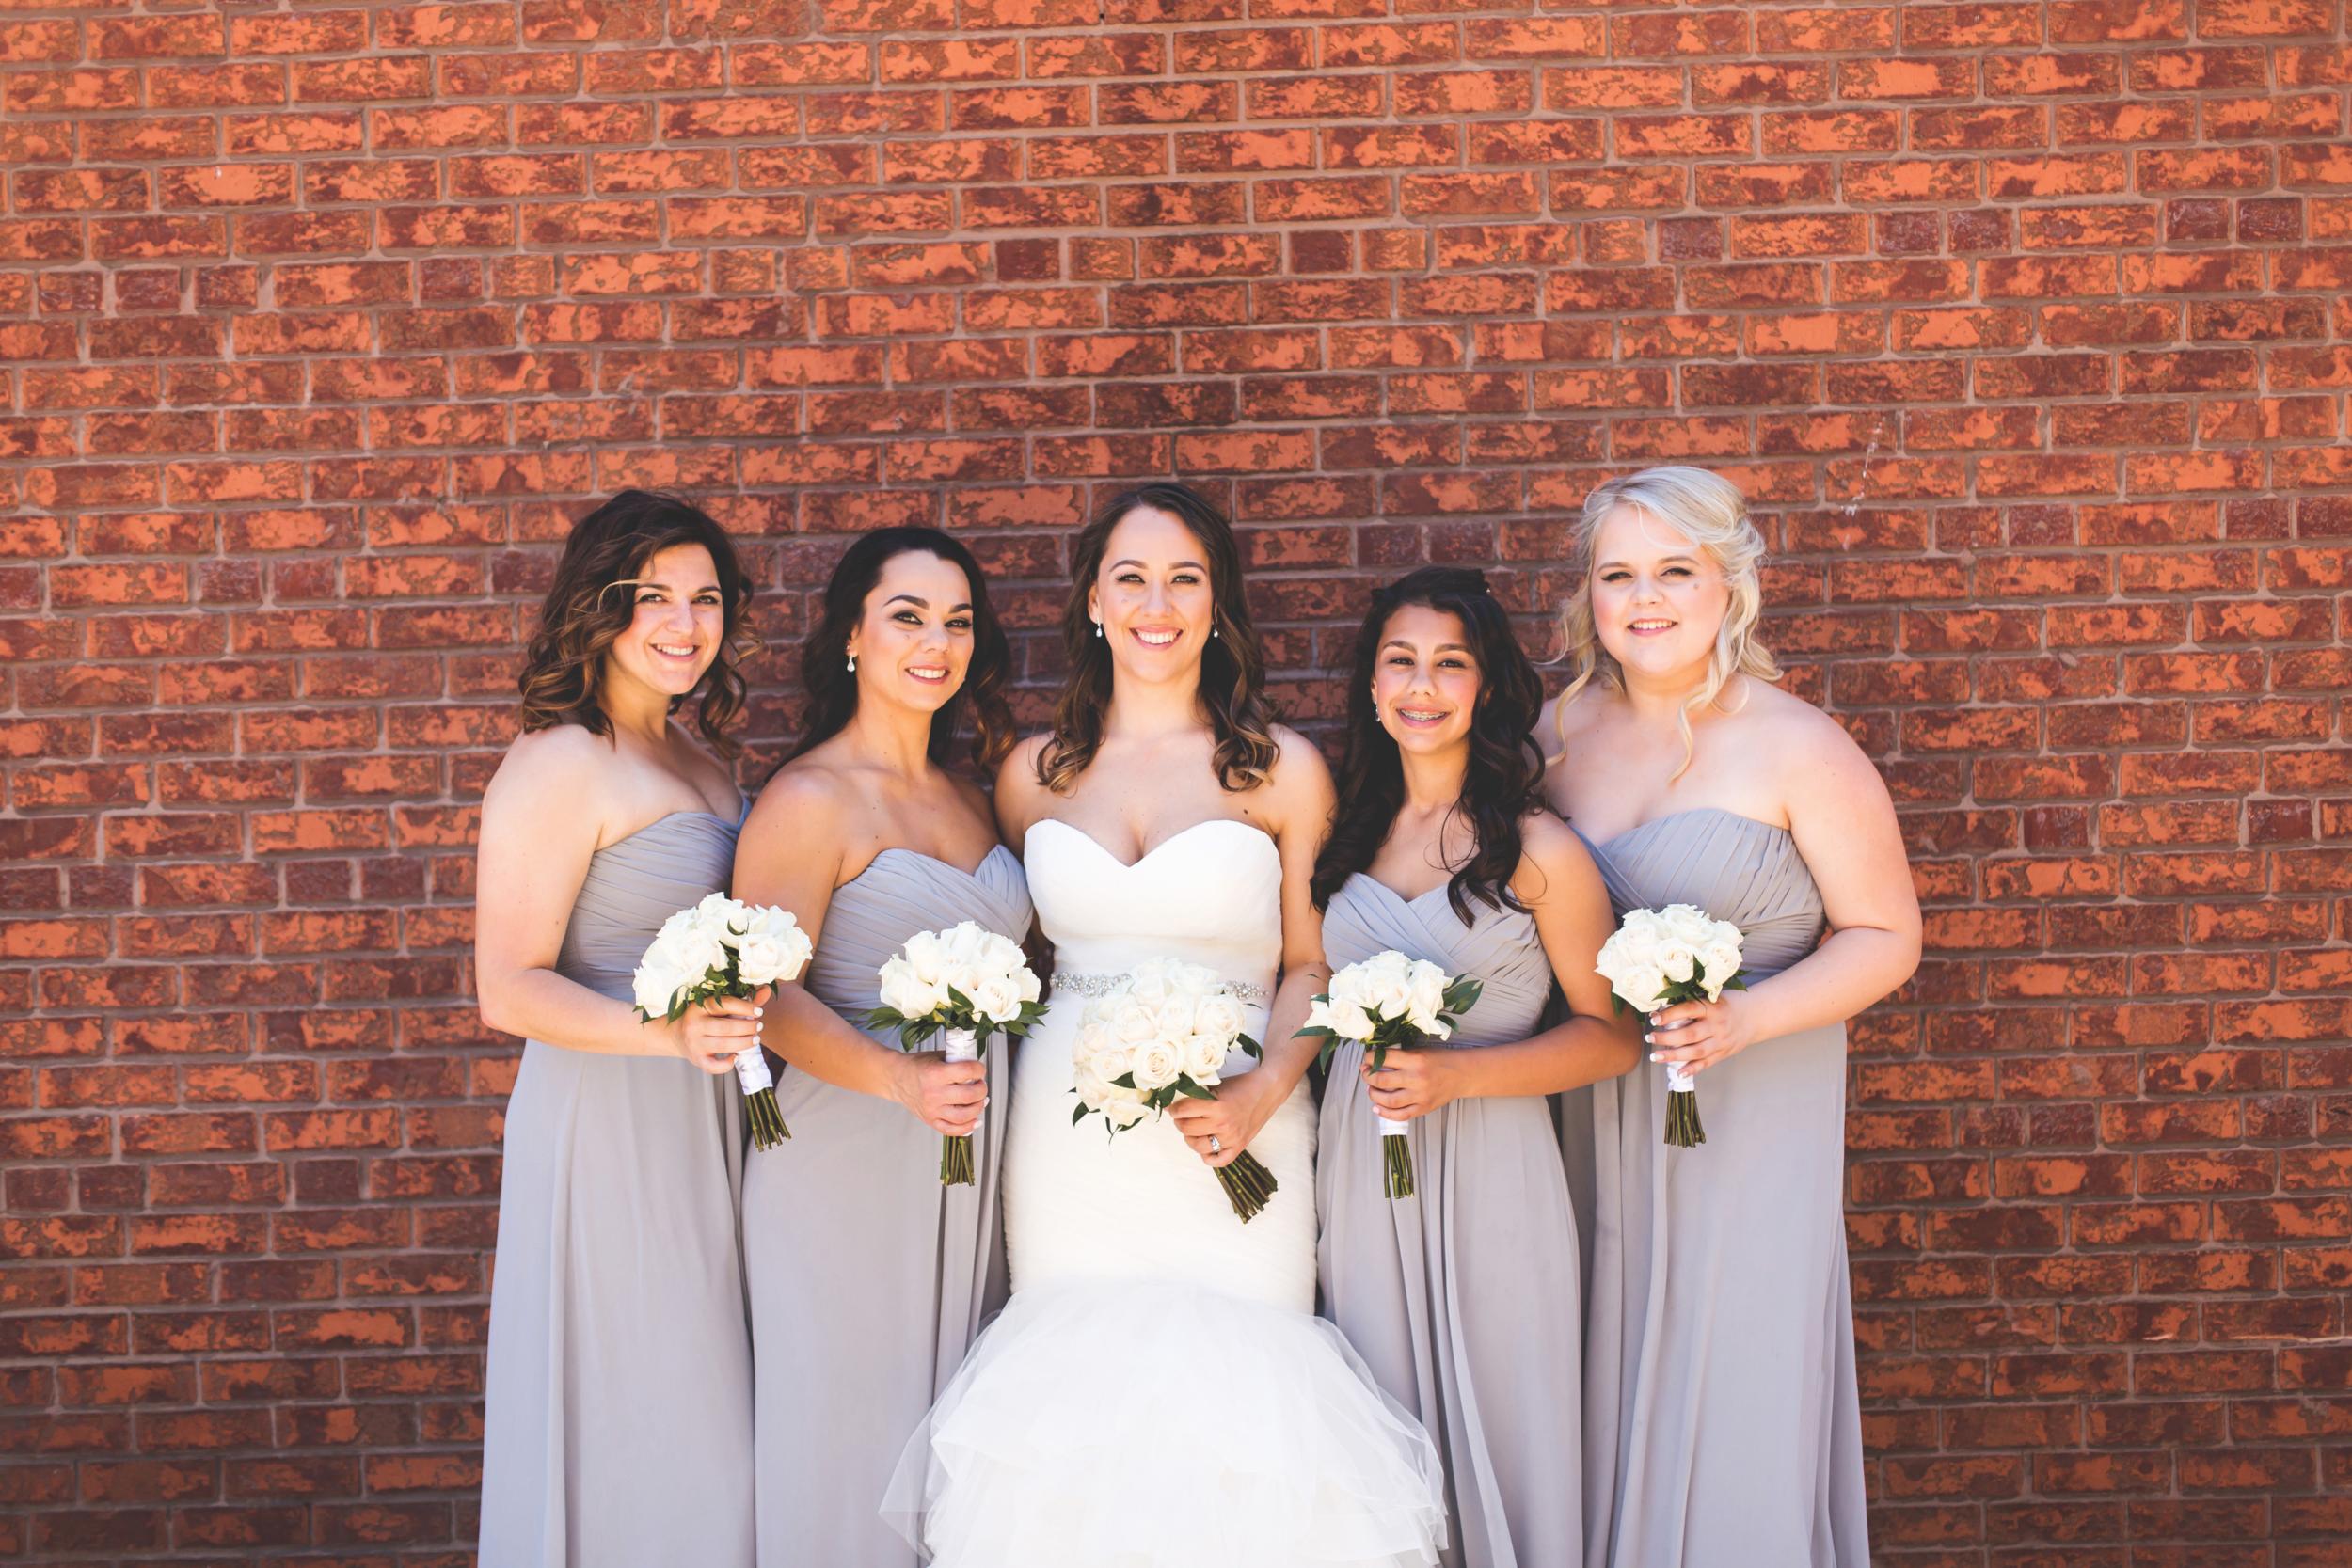 Wedding-Harbour-Banquet-Center-Oakville-Photographer-Wedding-Hamilton-Saint-James-Espresso-Downtown-HamOnt-GTA-Niagara-Toronto-Moments-by-Lauren-Photography-Photo-Image-38.png